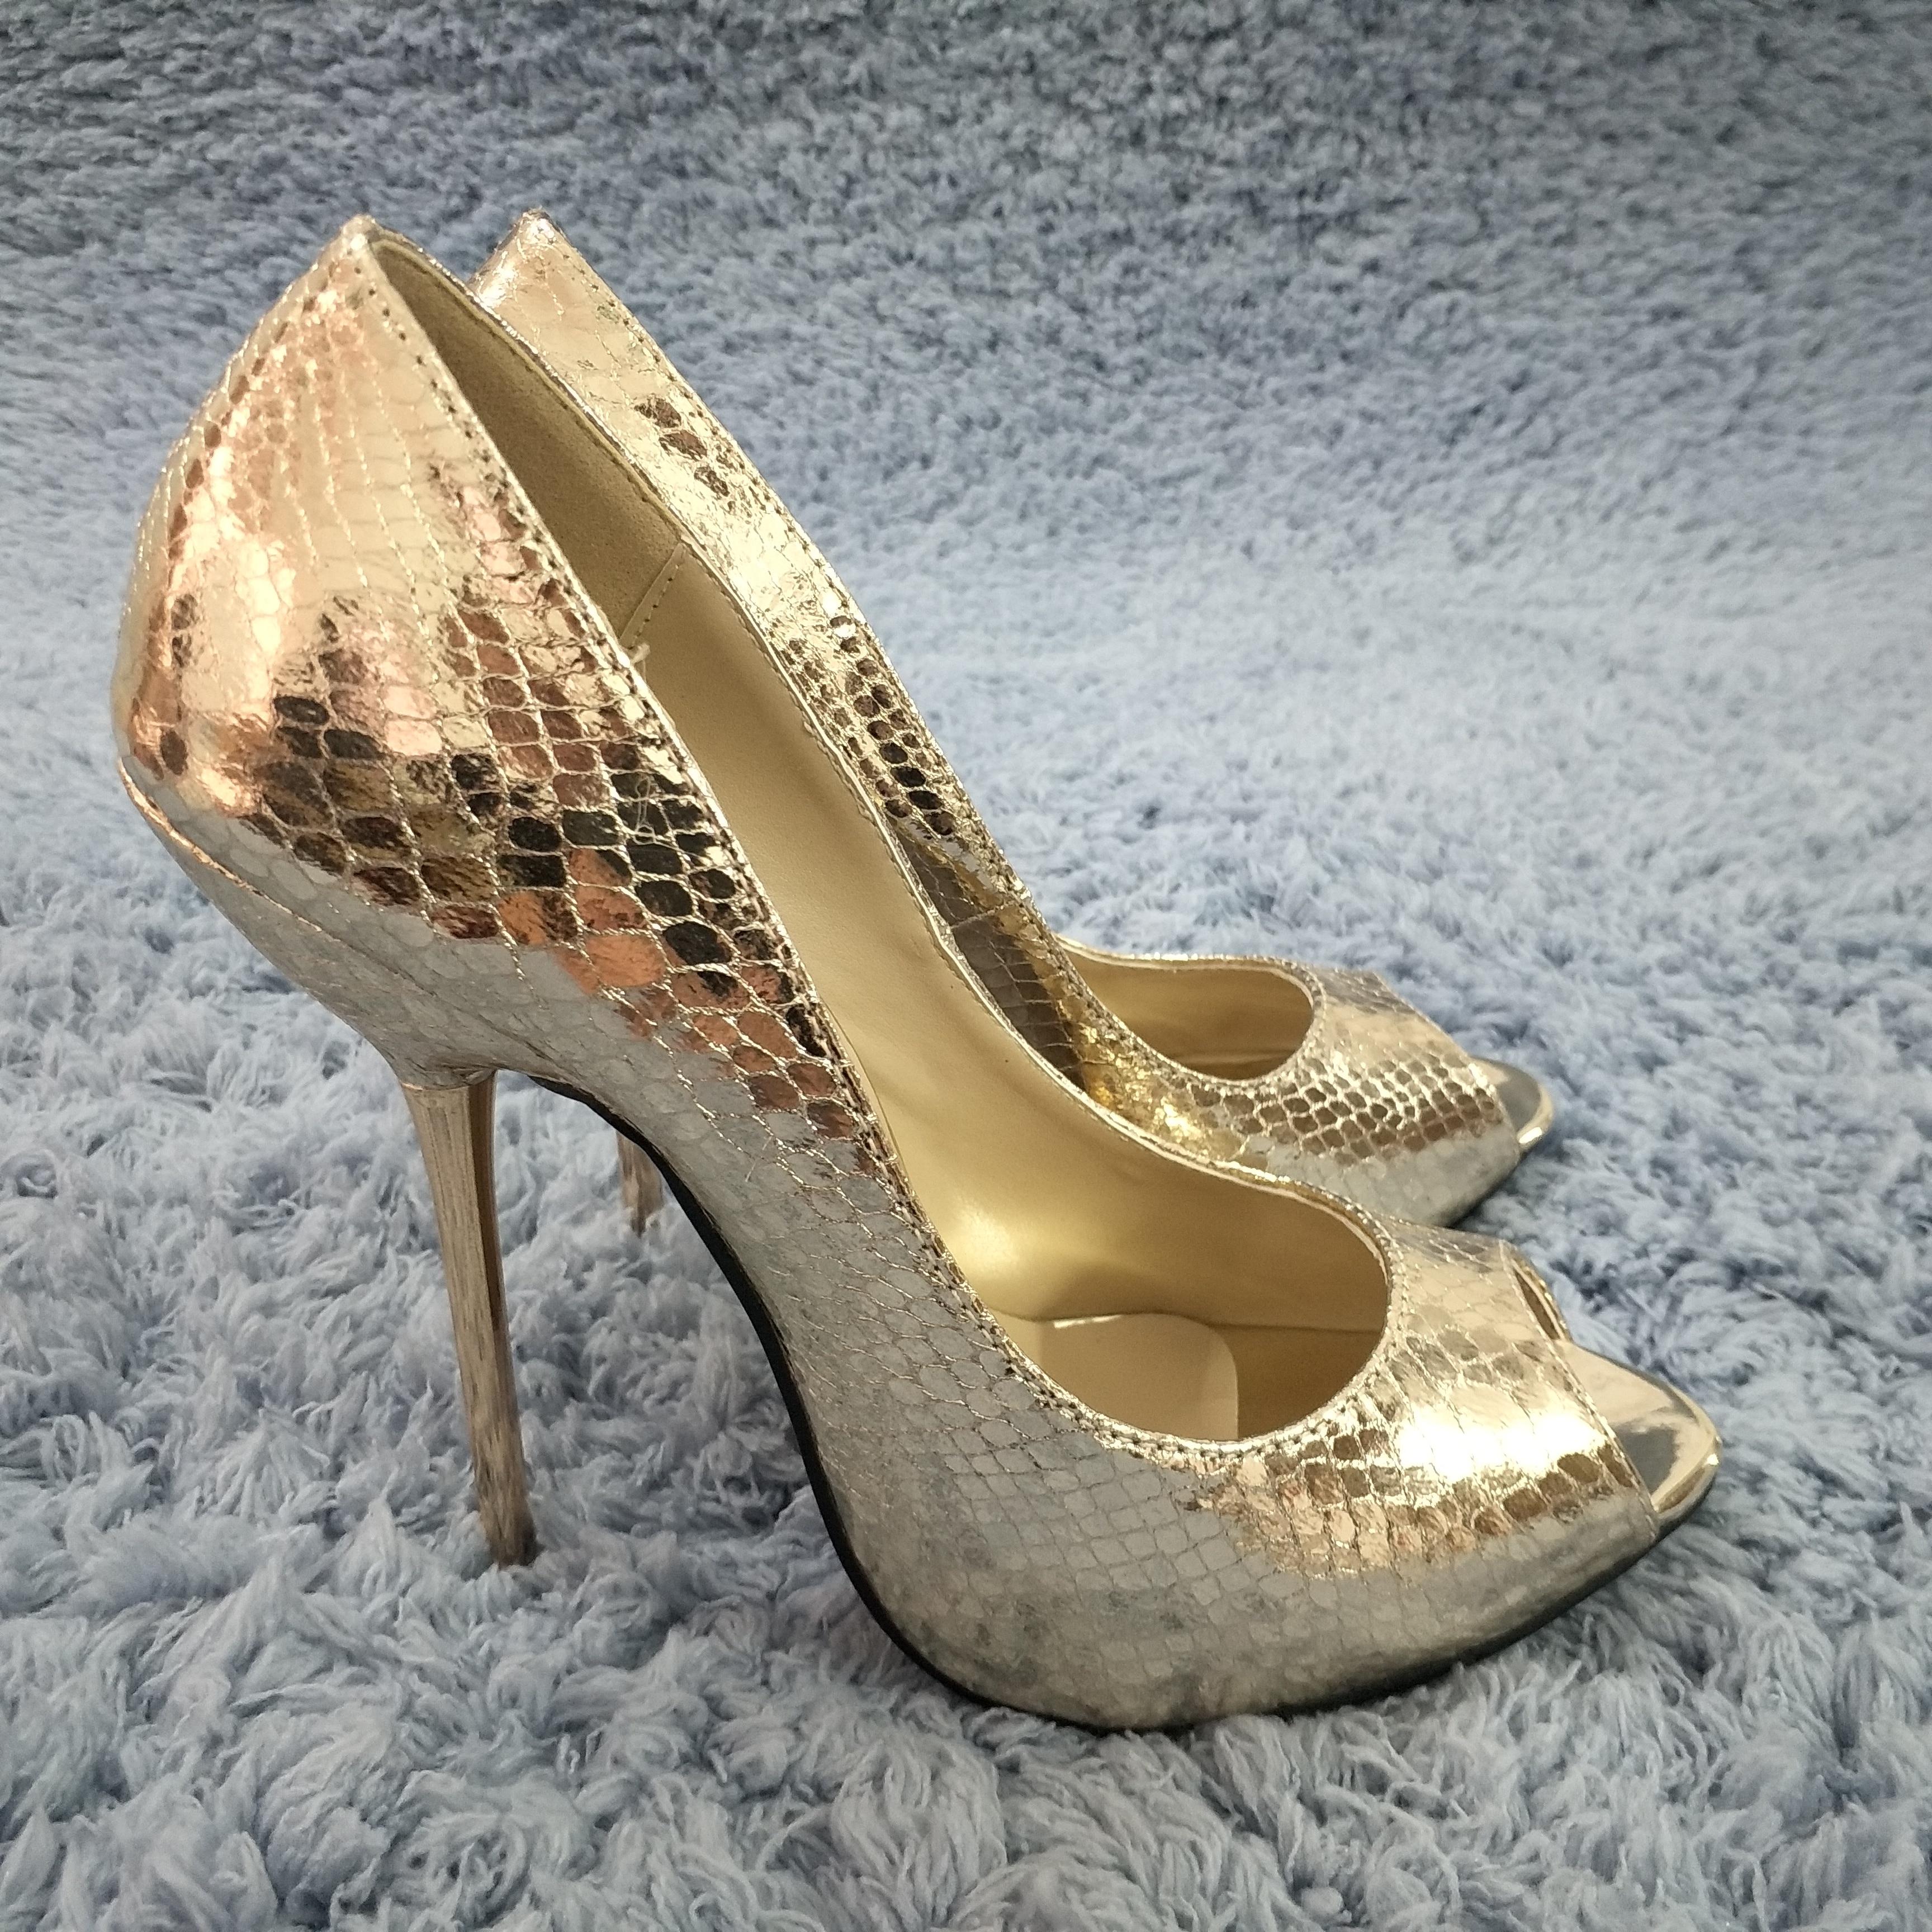 Women Stiletto Thin Iron High Heel Pumps Sexy Peep Toe Light Gold Snakeskin Fashion Party Bridal Ball Lady Shoes 3845-a13